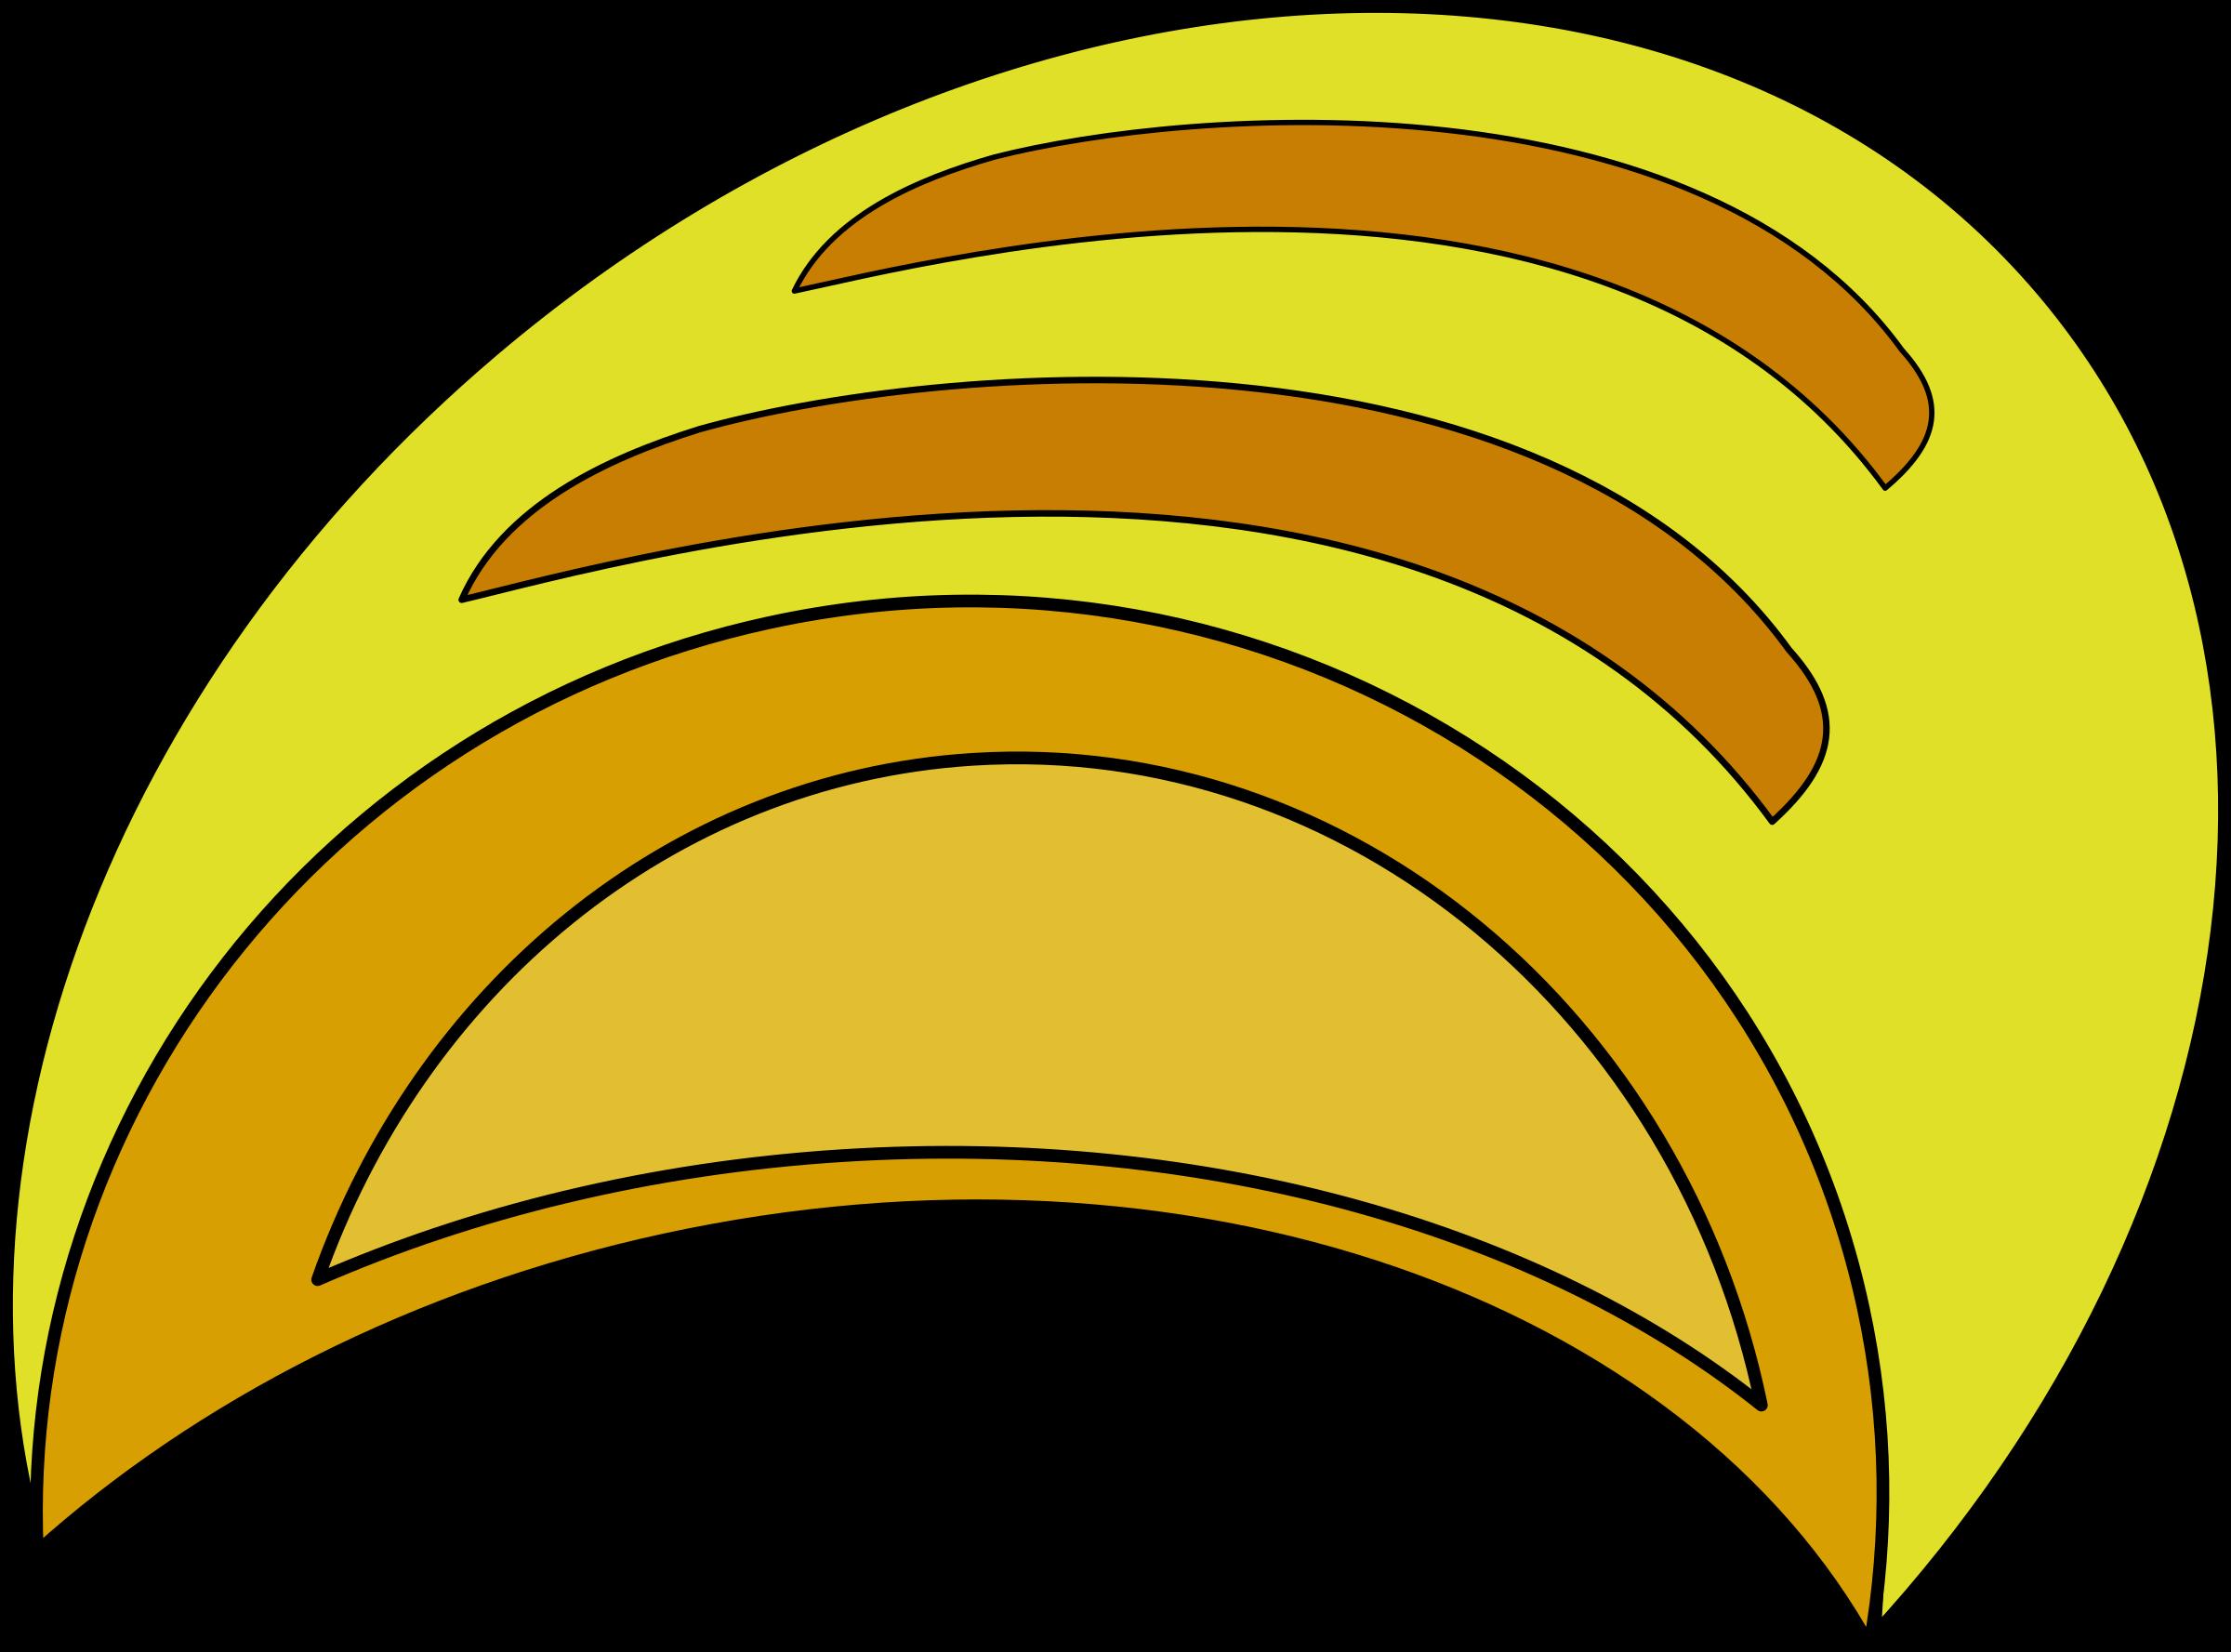 Circle clipart bread. Big image png